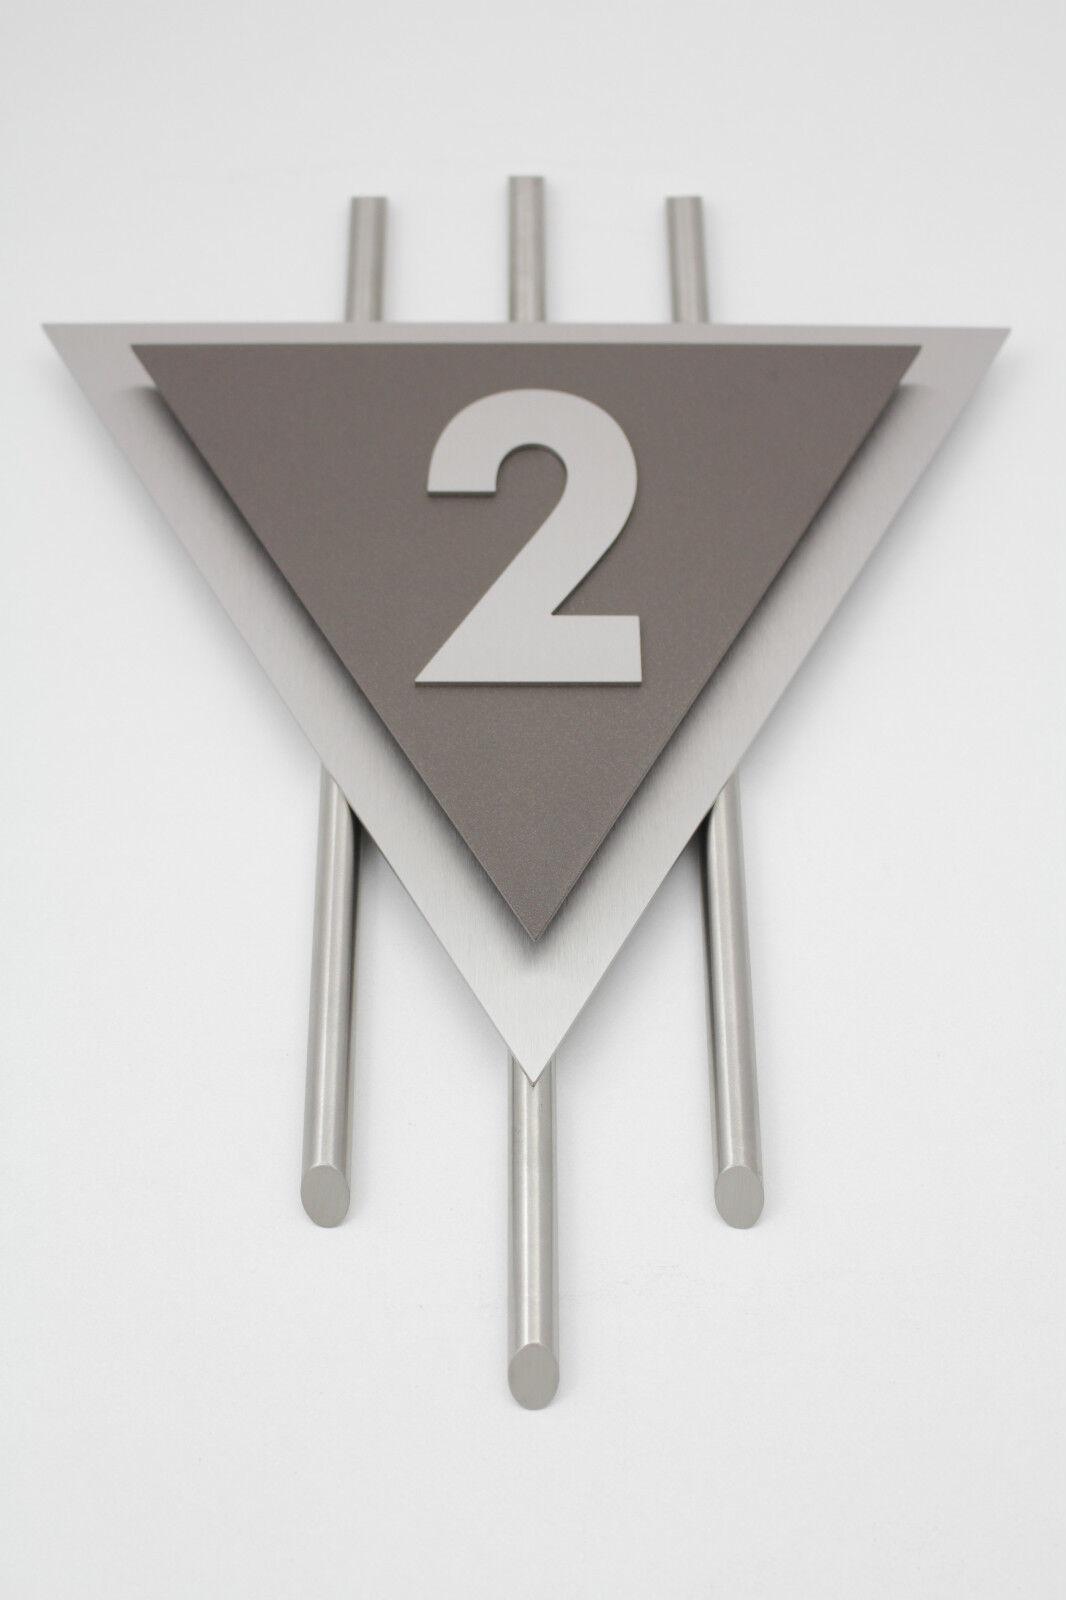 Hausnummer Edelstahl Sepia grau Exklusives Design Venus Zahl 1-9 V2A Zierstangen